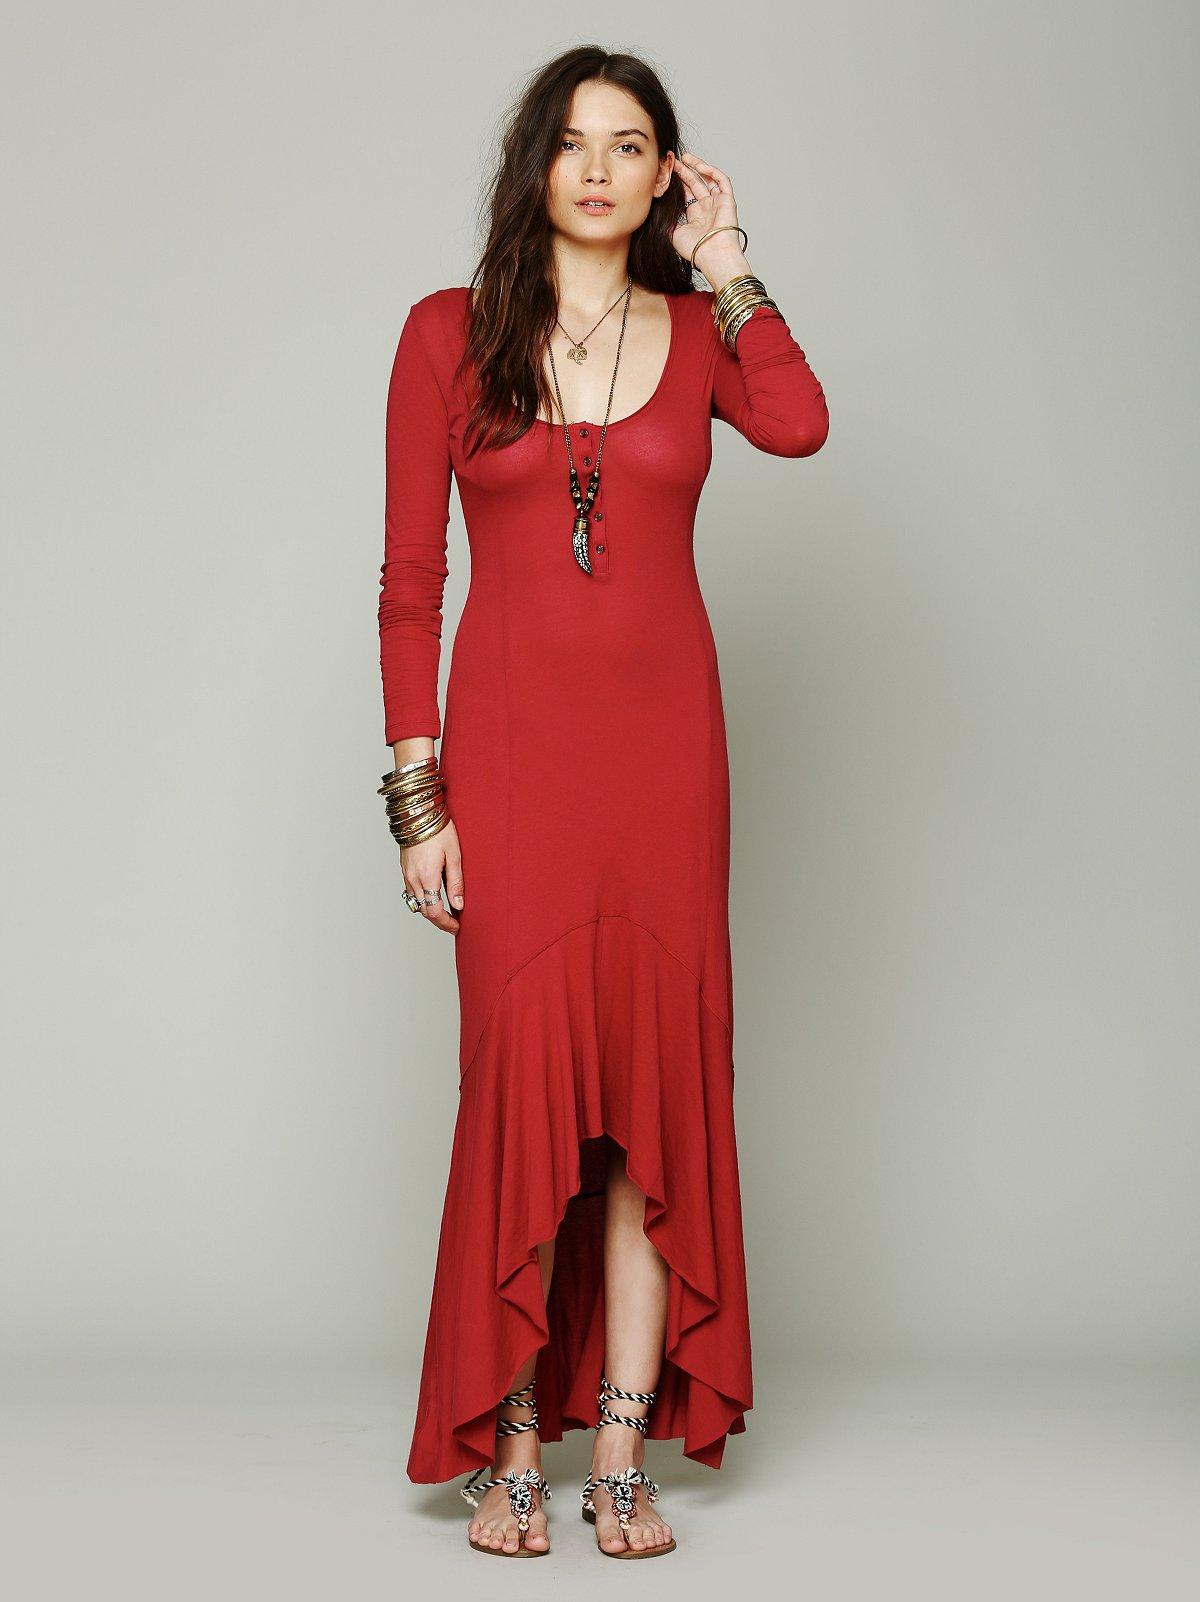 Jay Town Dress